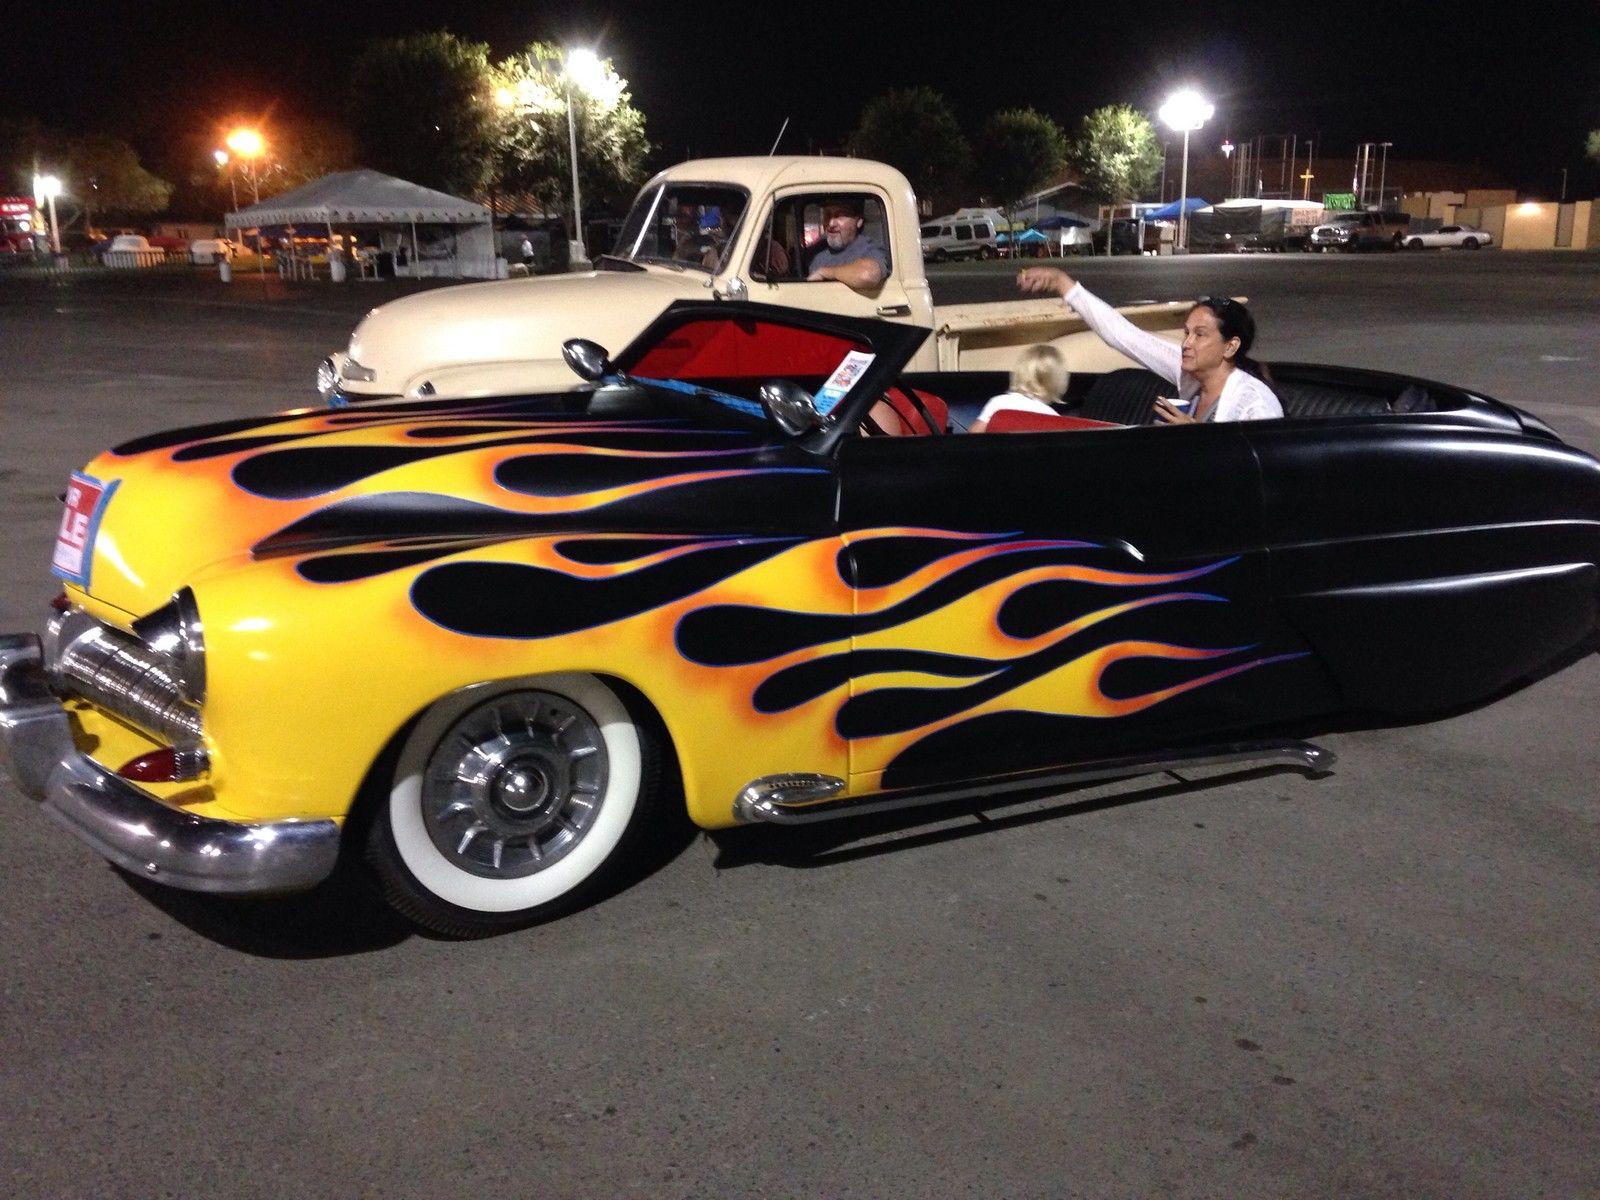 1950 Mercury Lead Sled Hot Rod W Fiberglass Carson Top